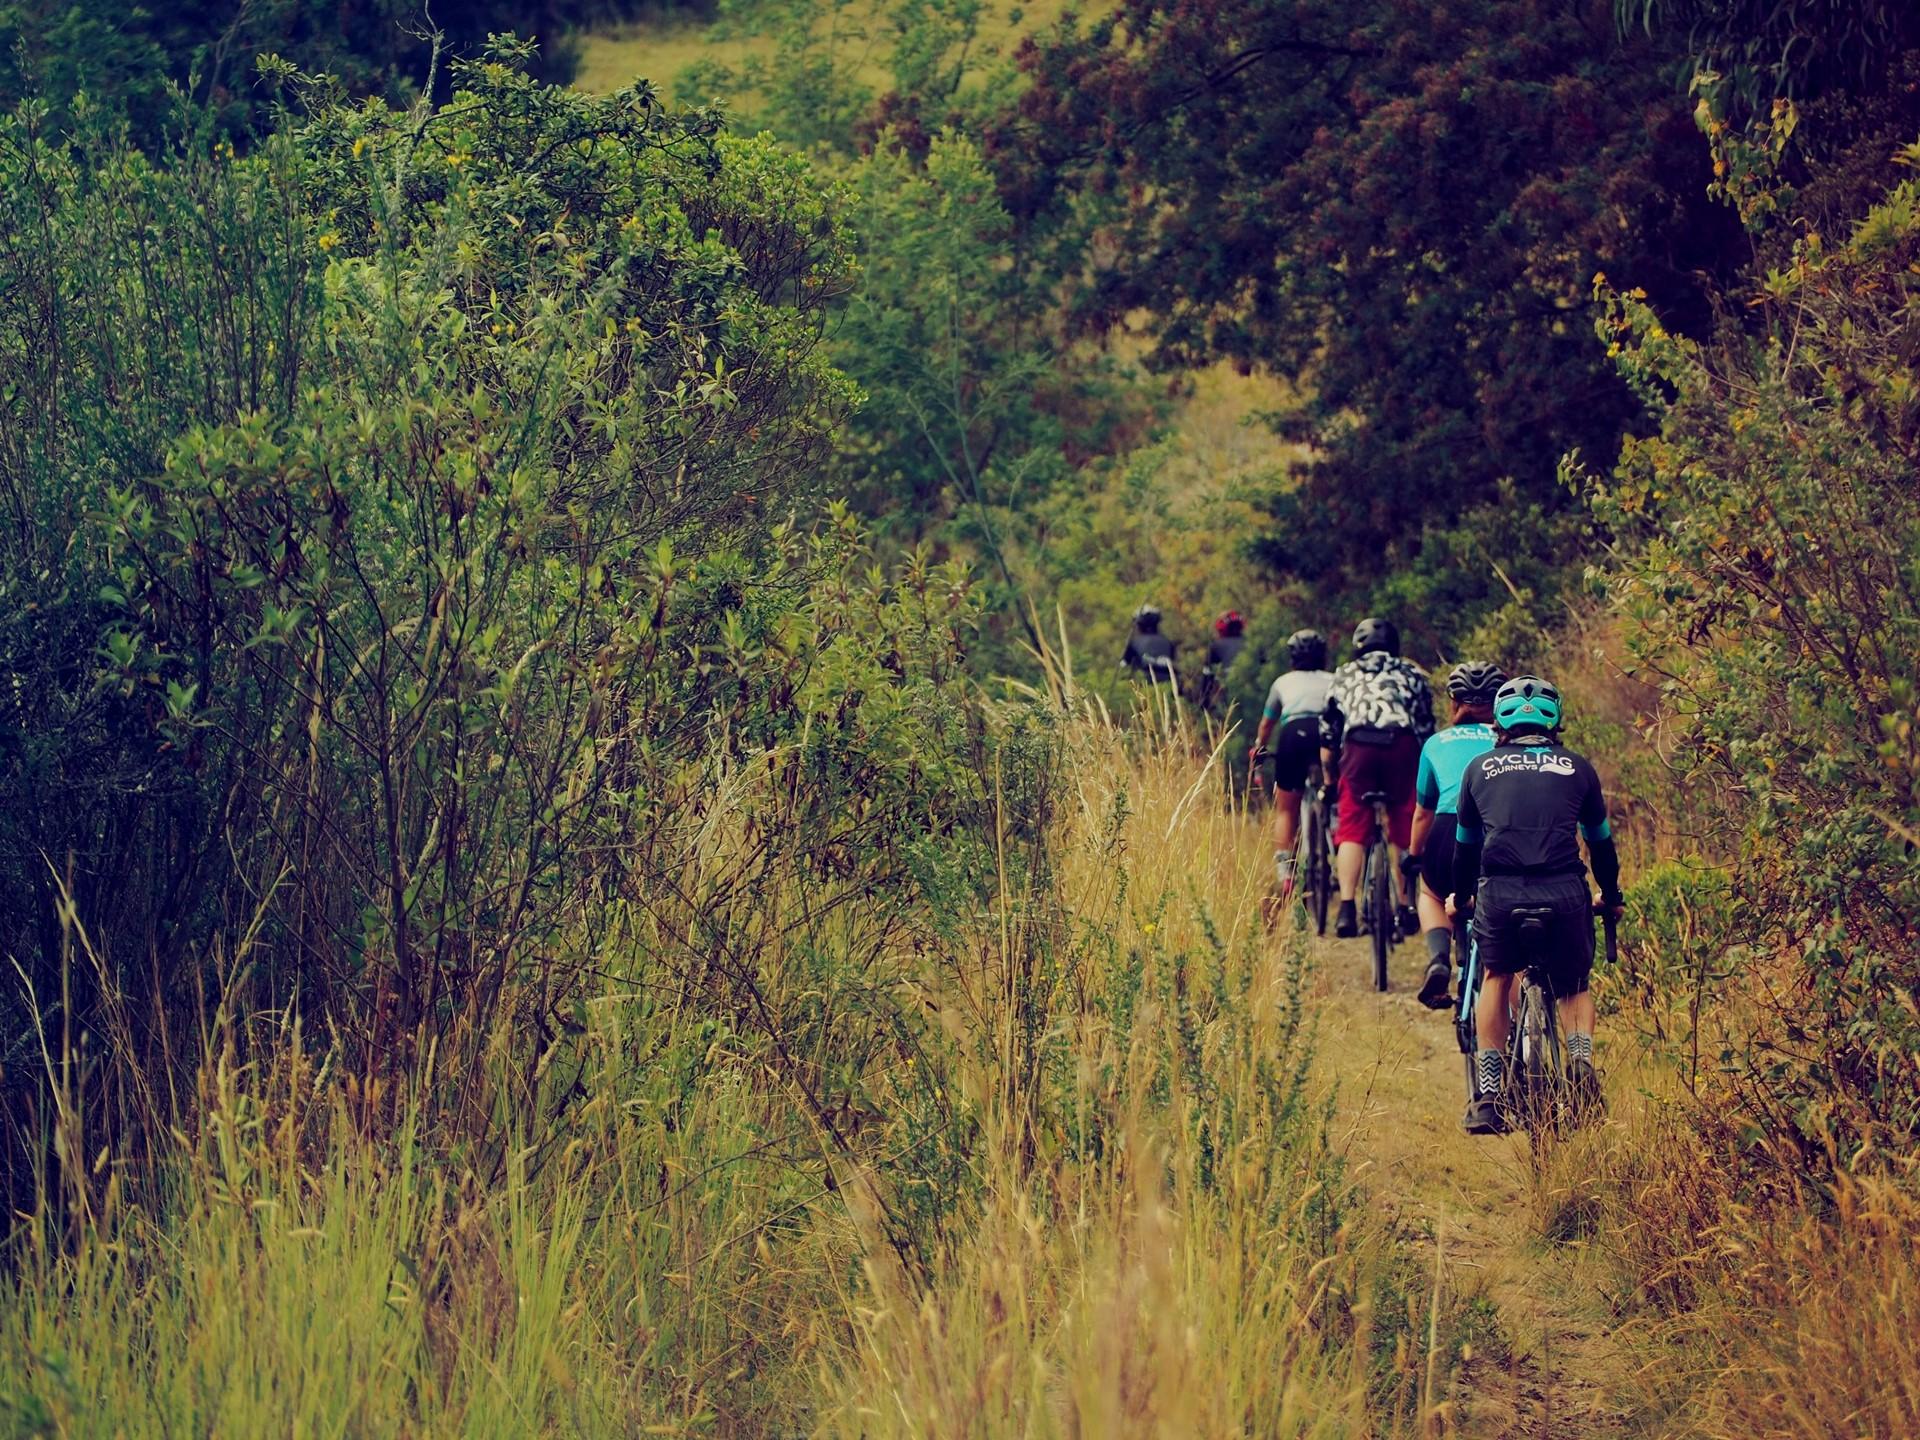 Suesca cundinamarca gravel bike trip